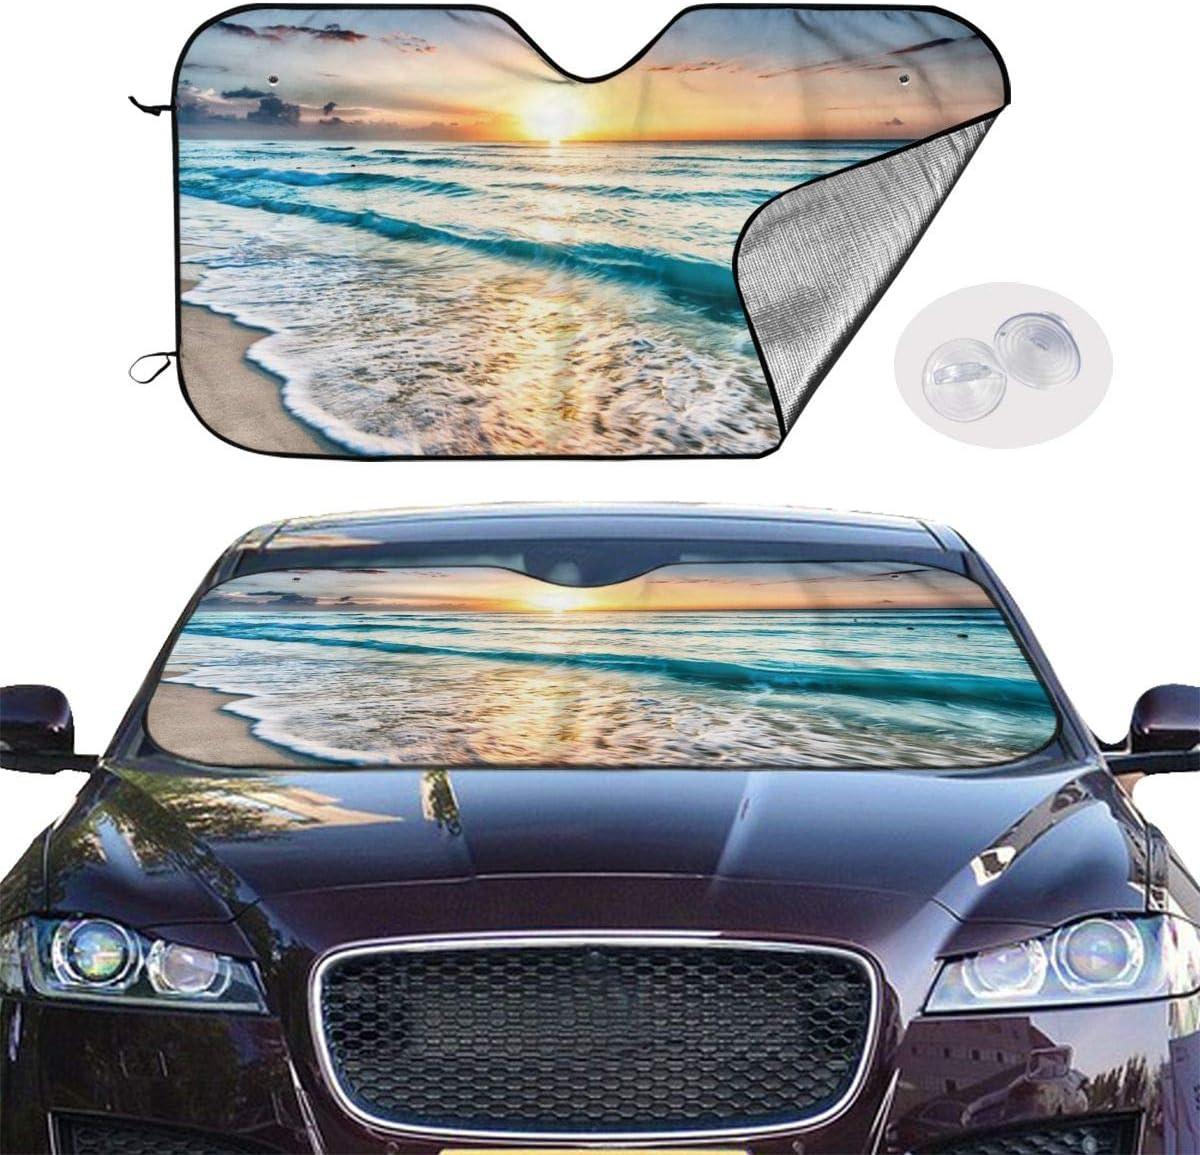 FATTTYCY 3D Realistic Dinosaur Car Windshield Sun Shade Sunshade for Car Truck SUV Block Uv Rays Universal Fit Vehicle Window Cover Visor Protector